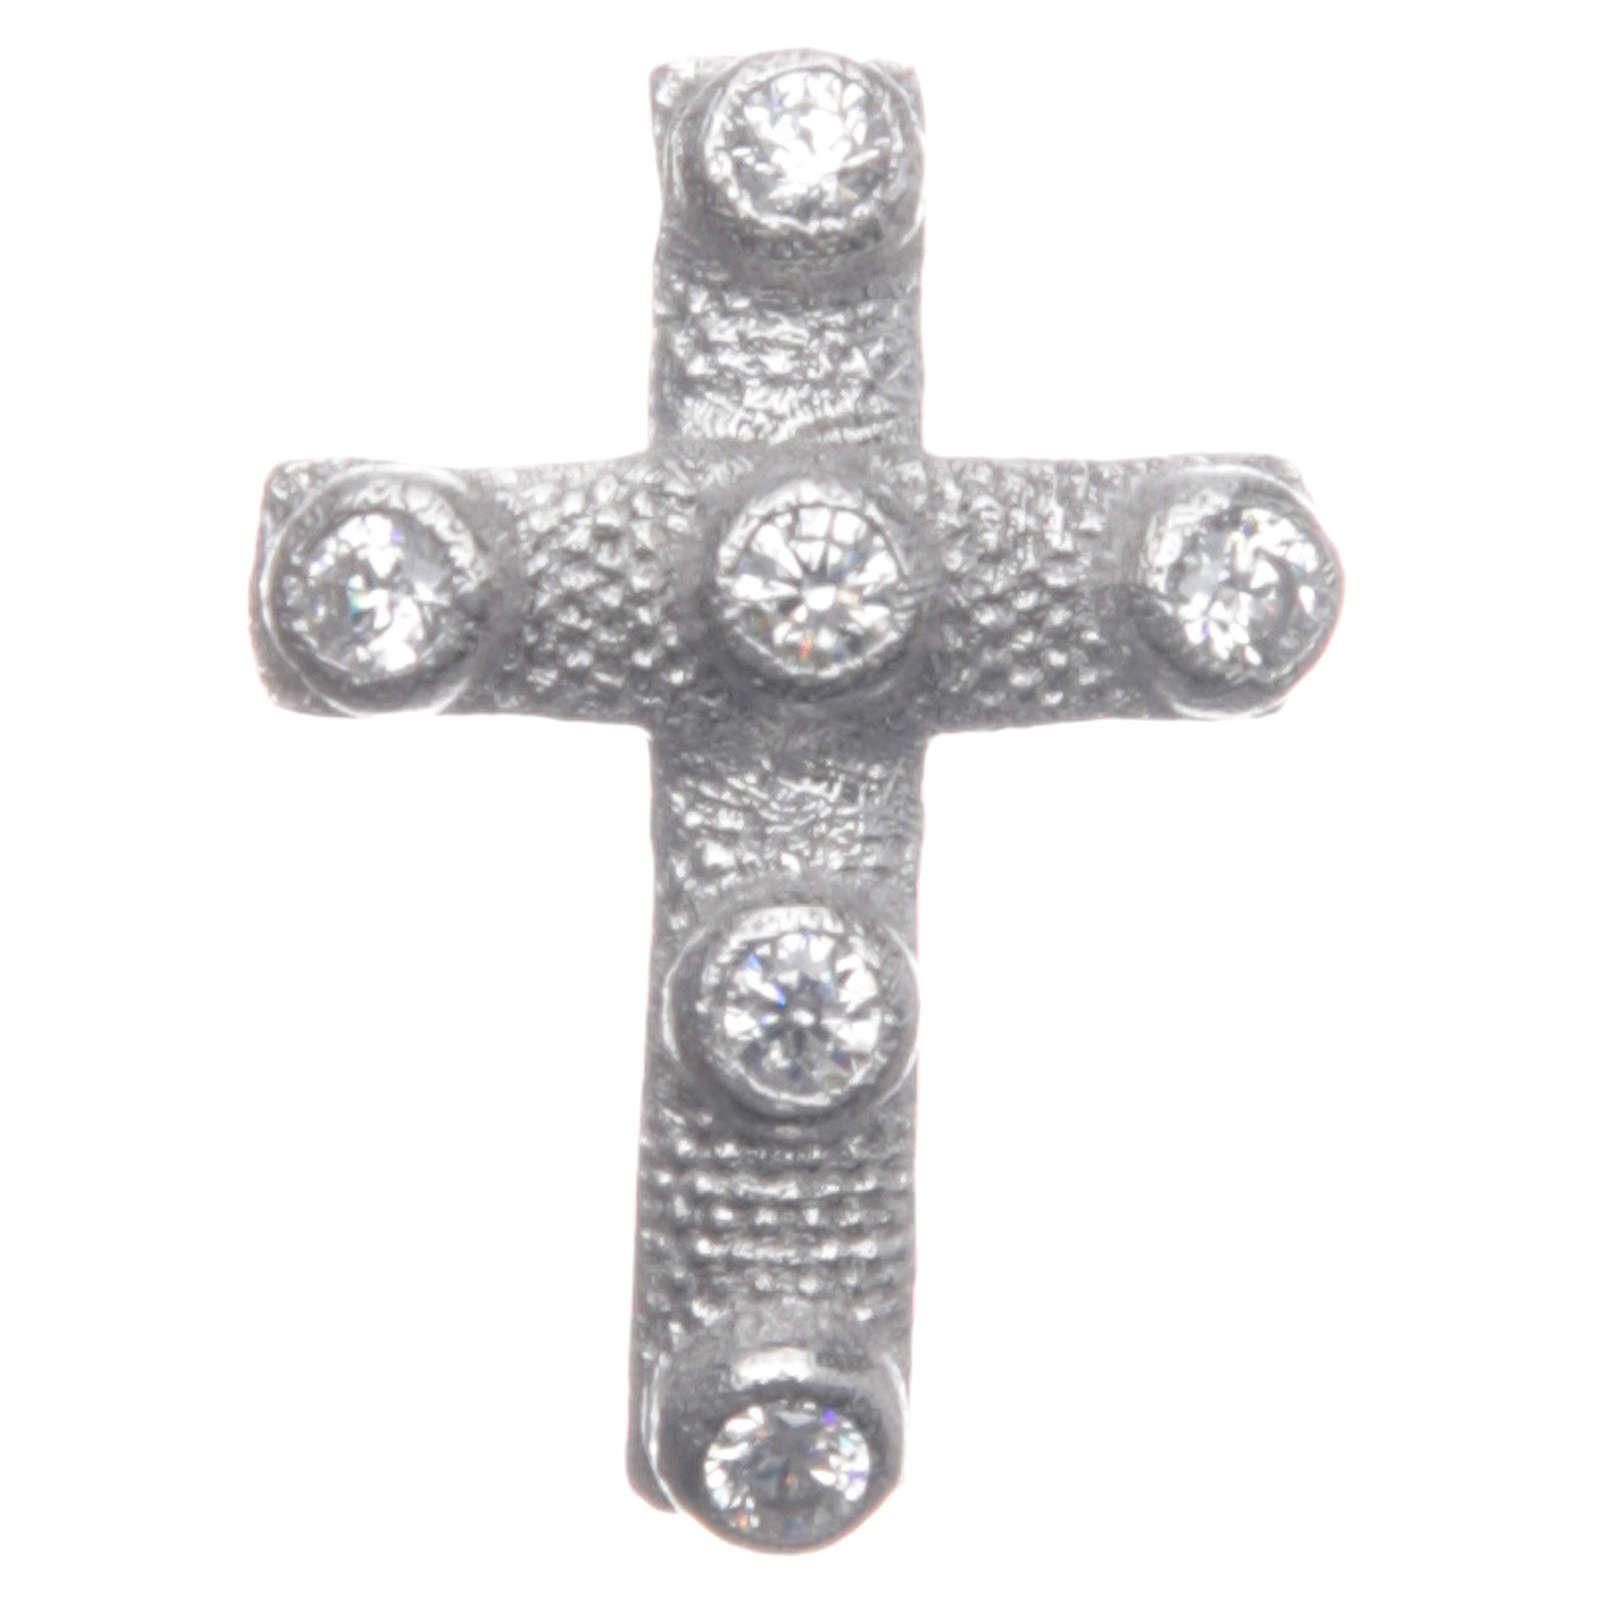 Croce pendente Argento 925 e zirconi bianchi 2x1,5 cm 4